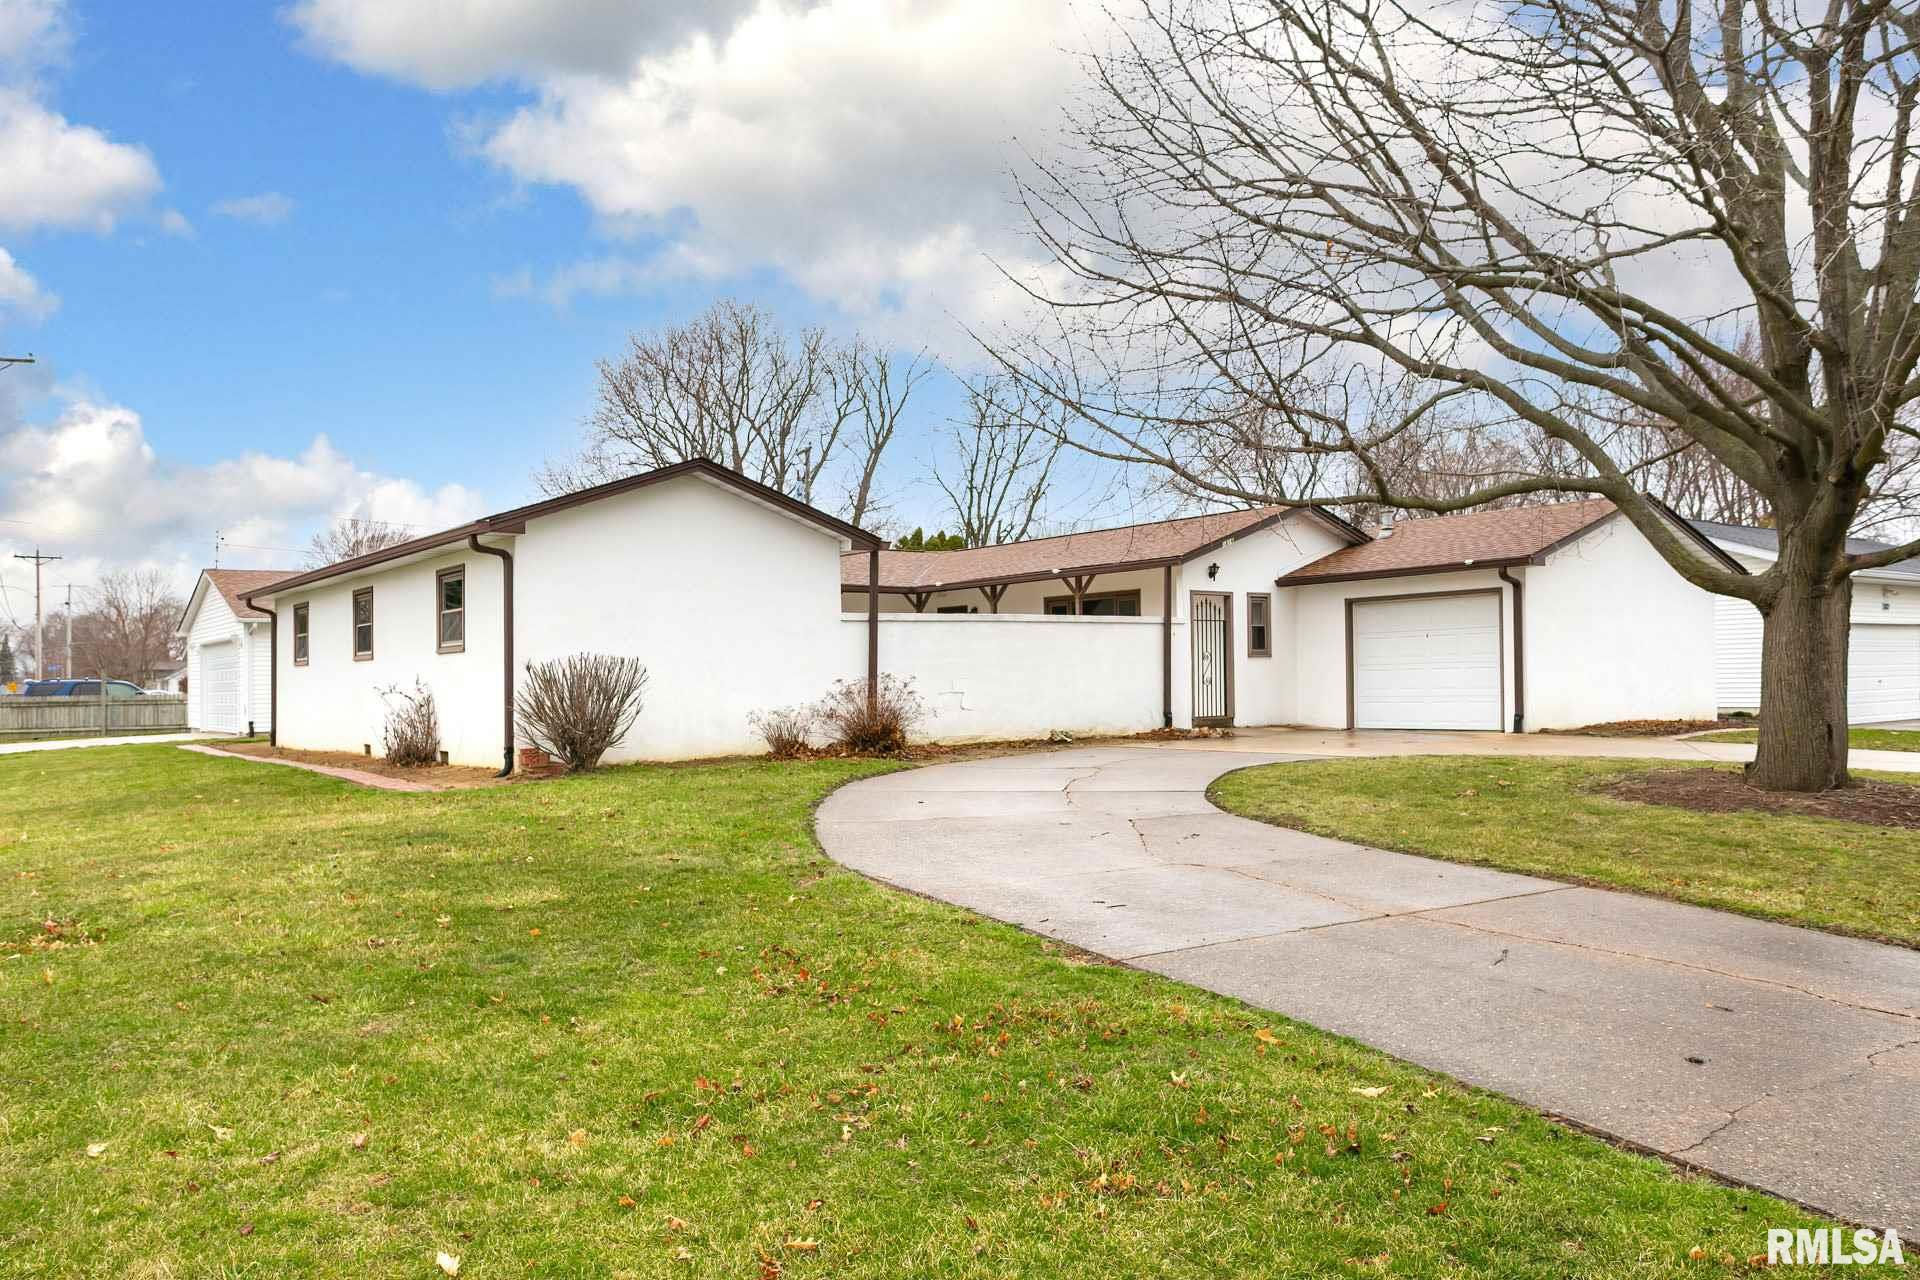 1816 E 4TH Property Photo - Coal Valley, IL real estate listing